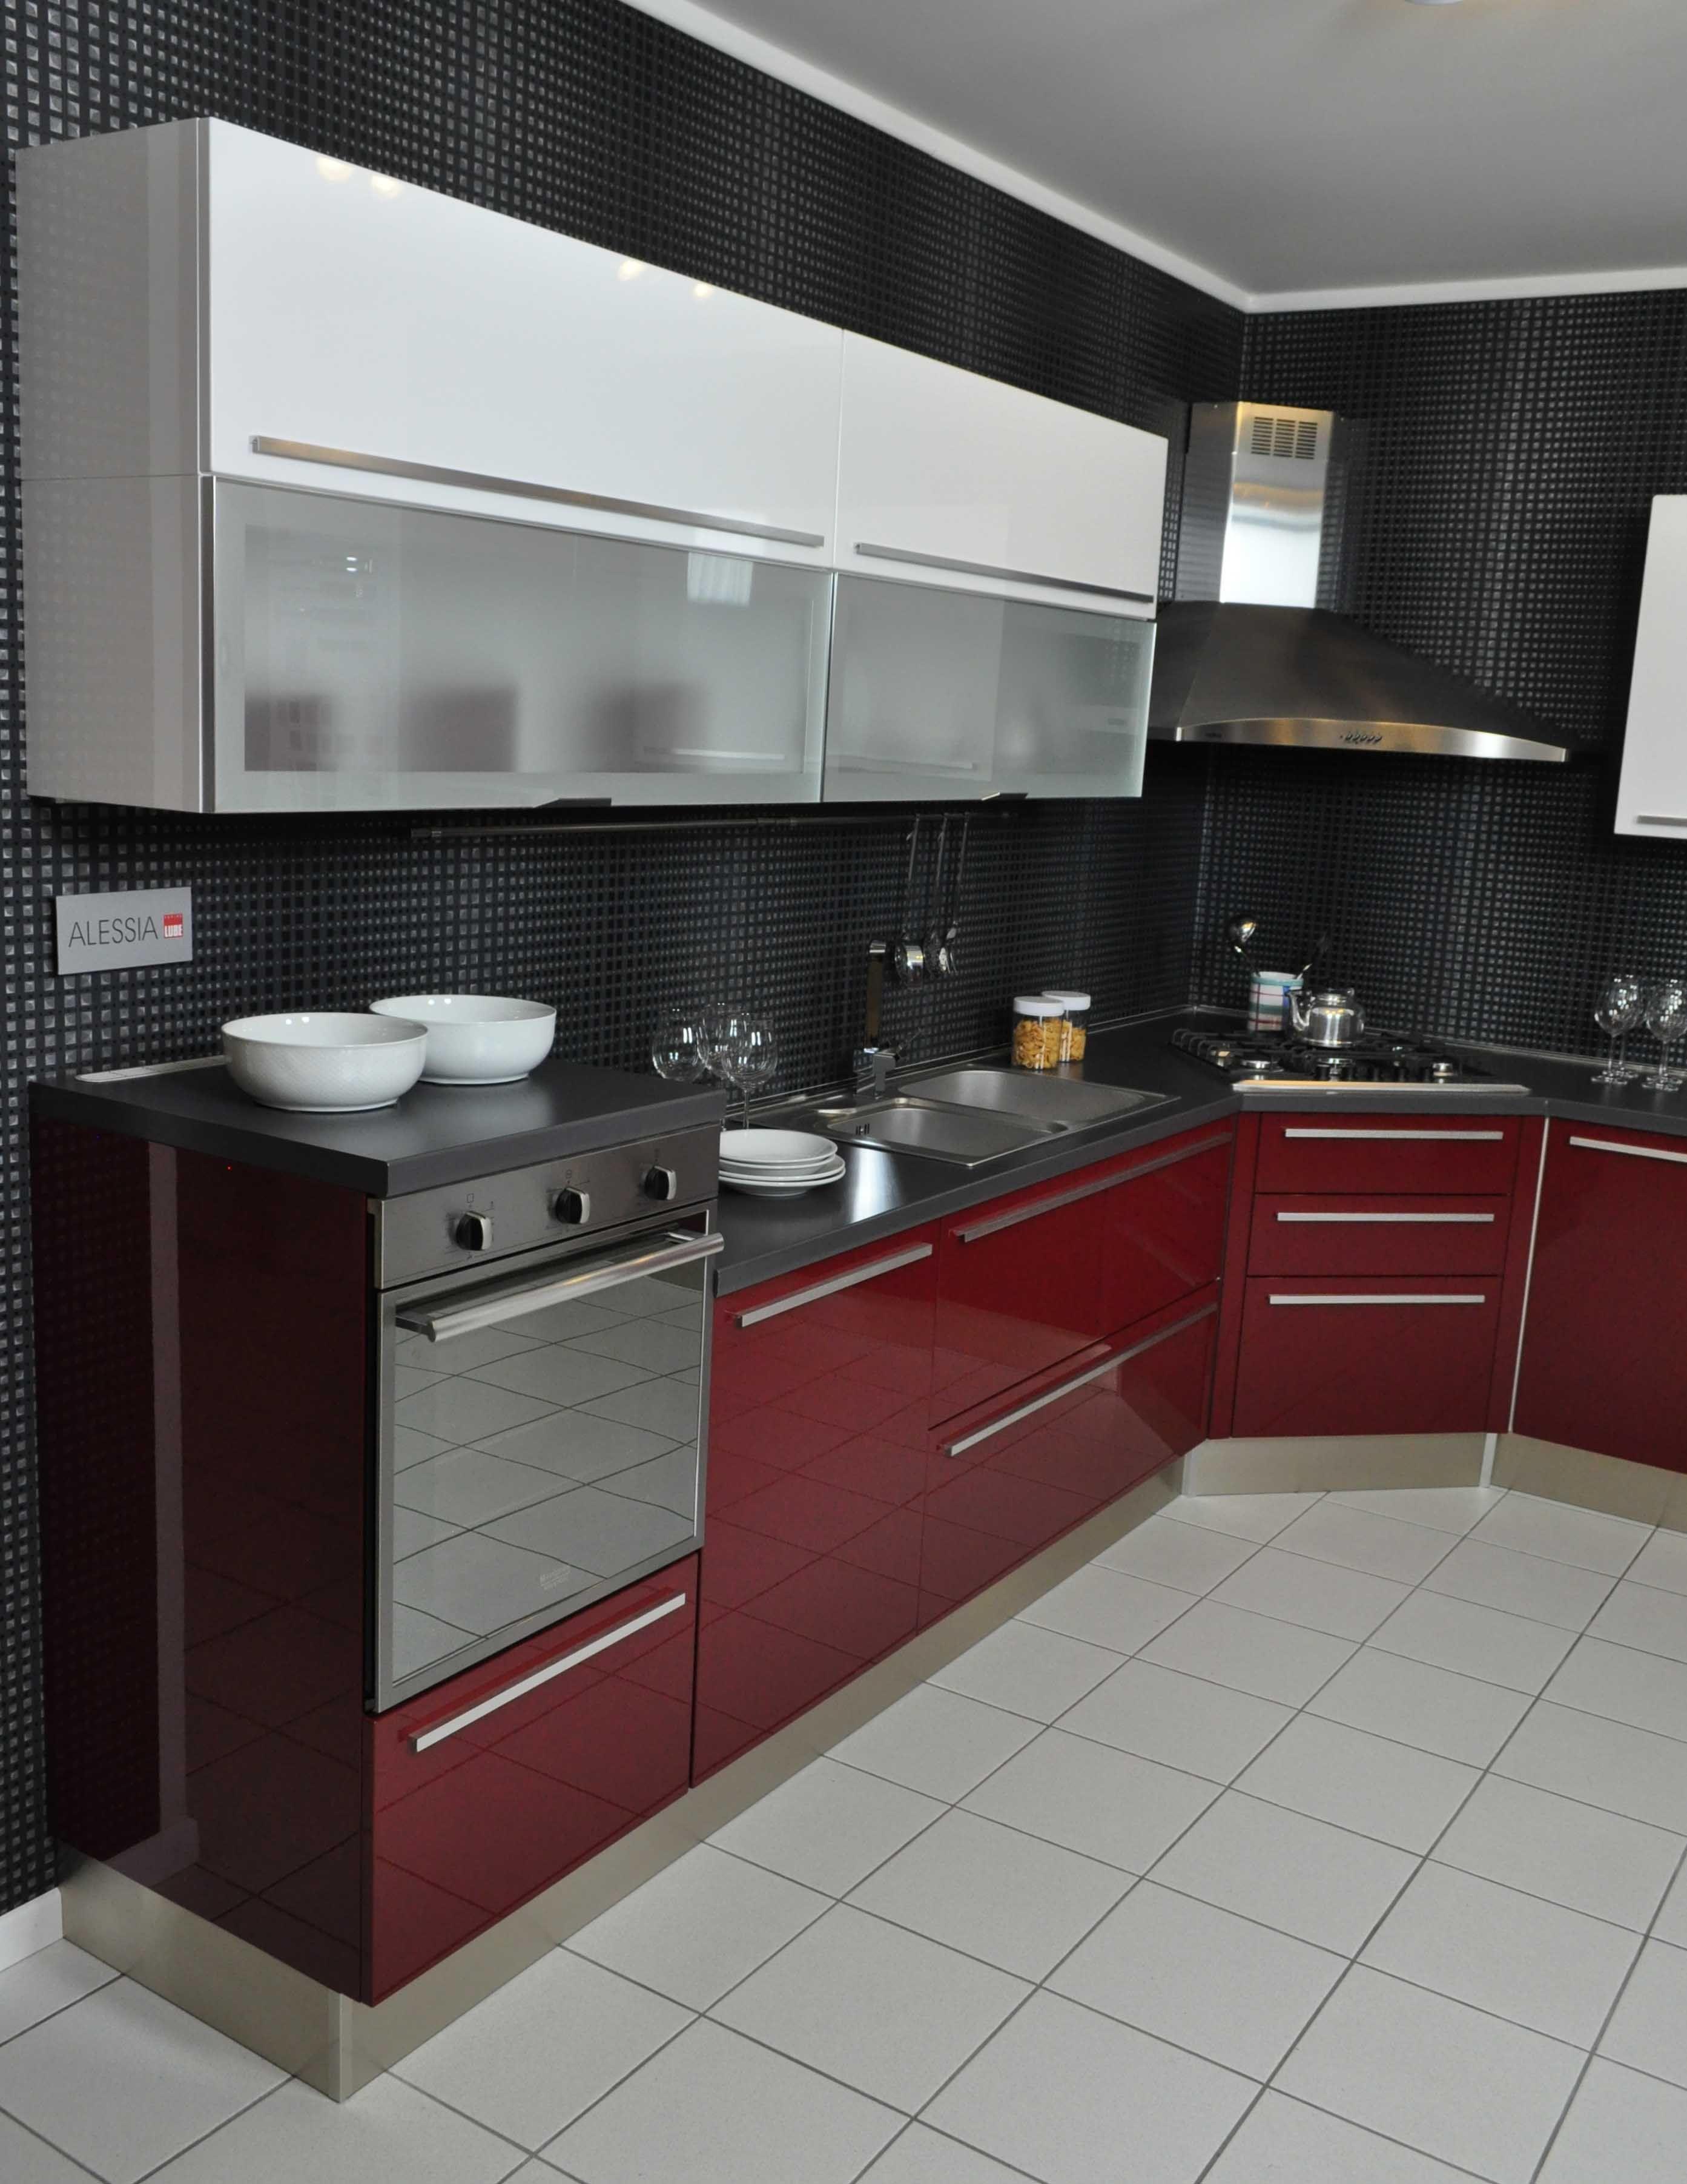 Immagine di http://www.outletarredamento.it/img/cucine/cucina-lube ...